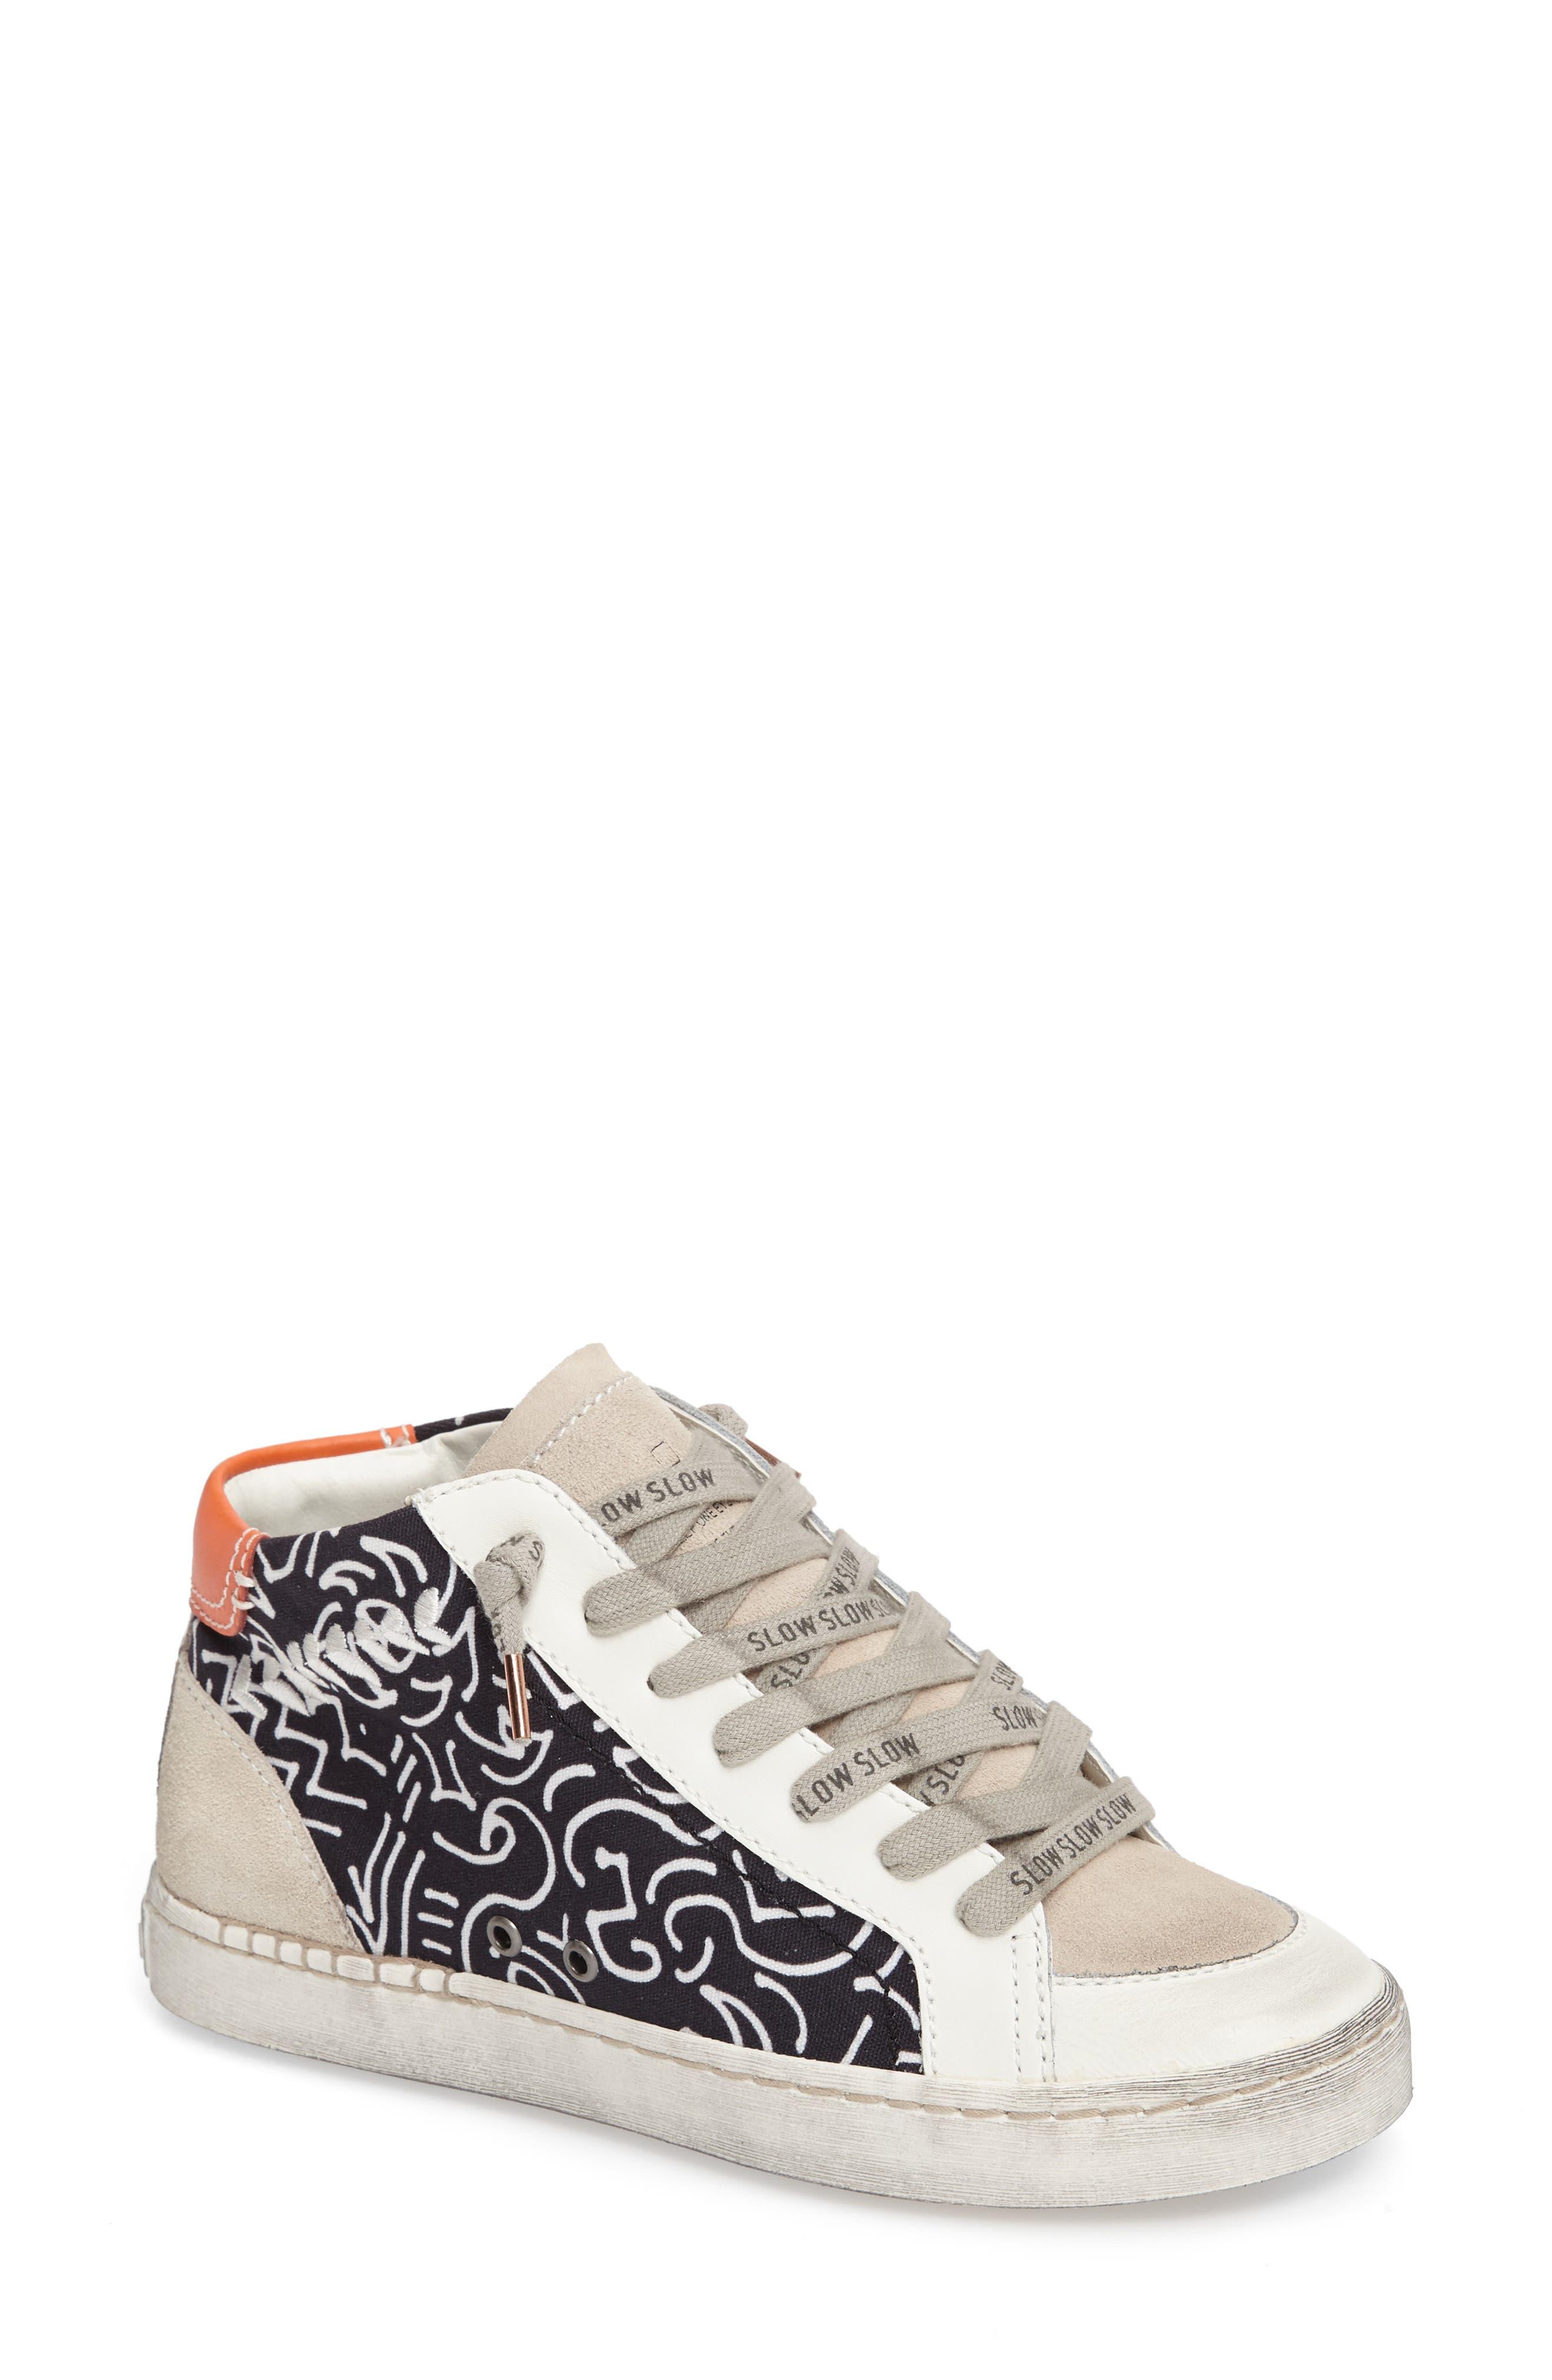 Main Image - Dolce Vita Zane Mid Top Multi Finish Sneaker (Women)